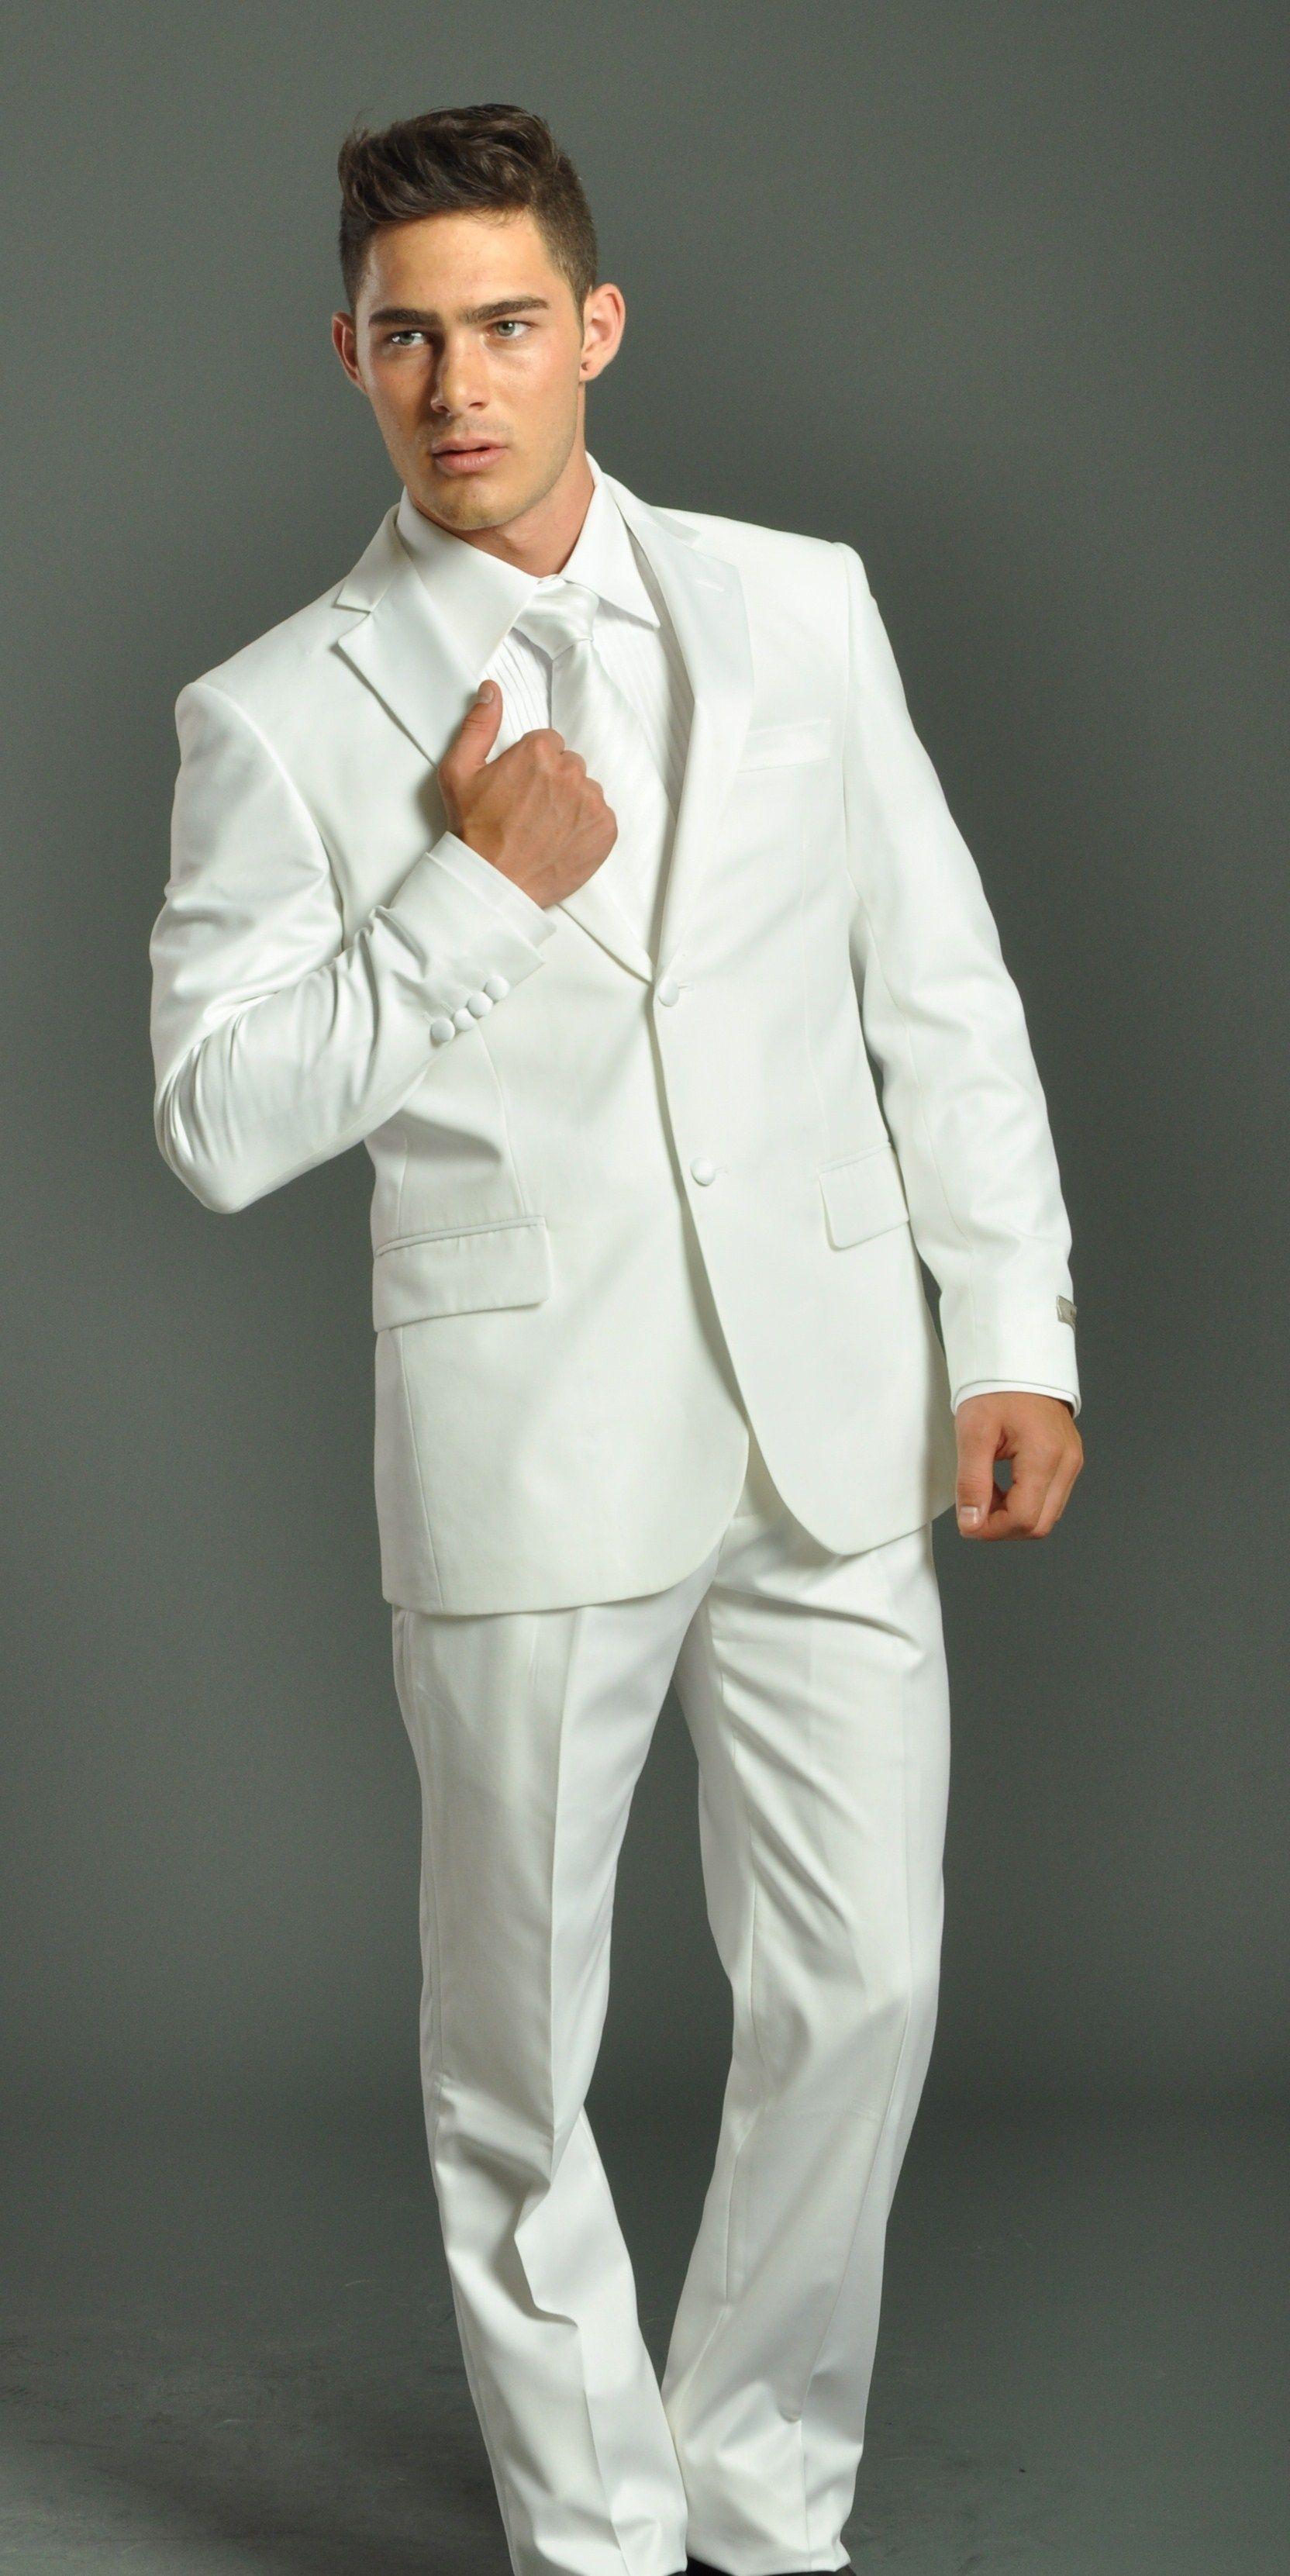 men & women in white suit | Men\'s Two Button Solid White Tuxedo Suit ...